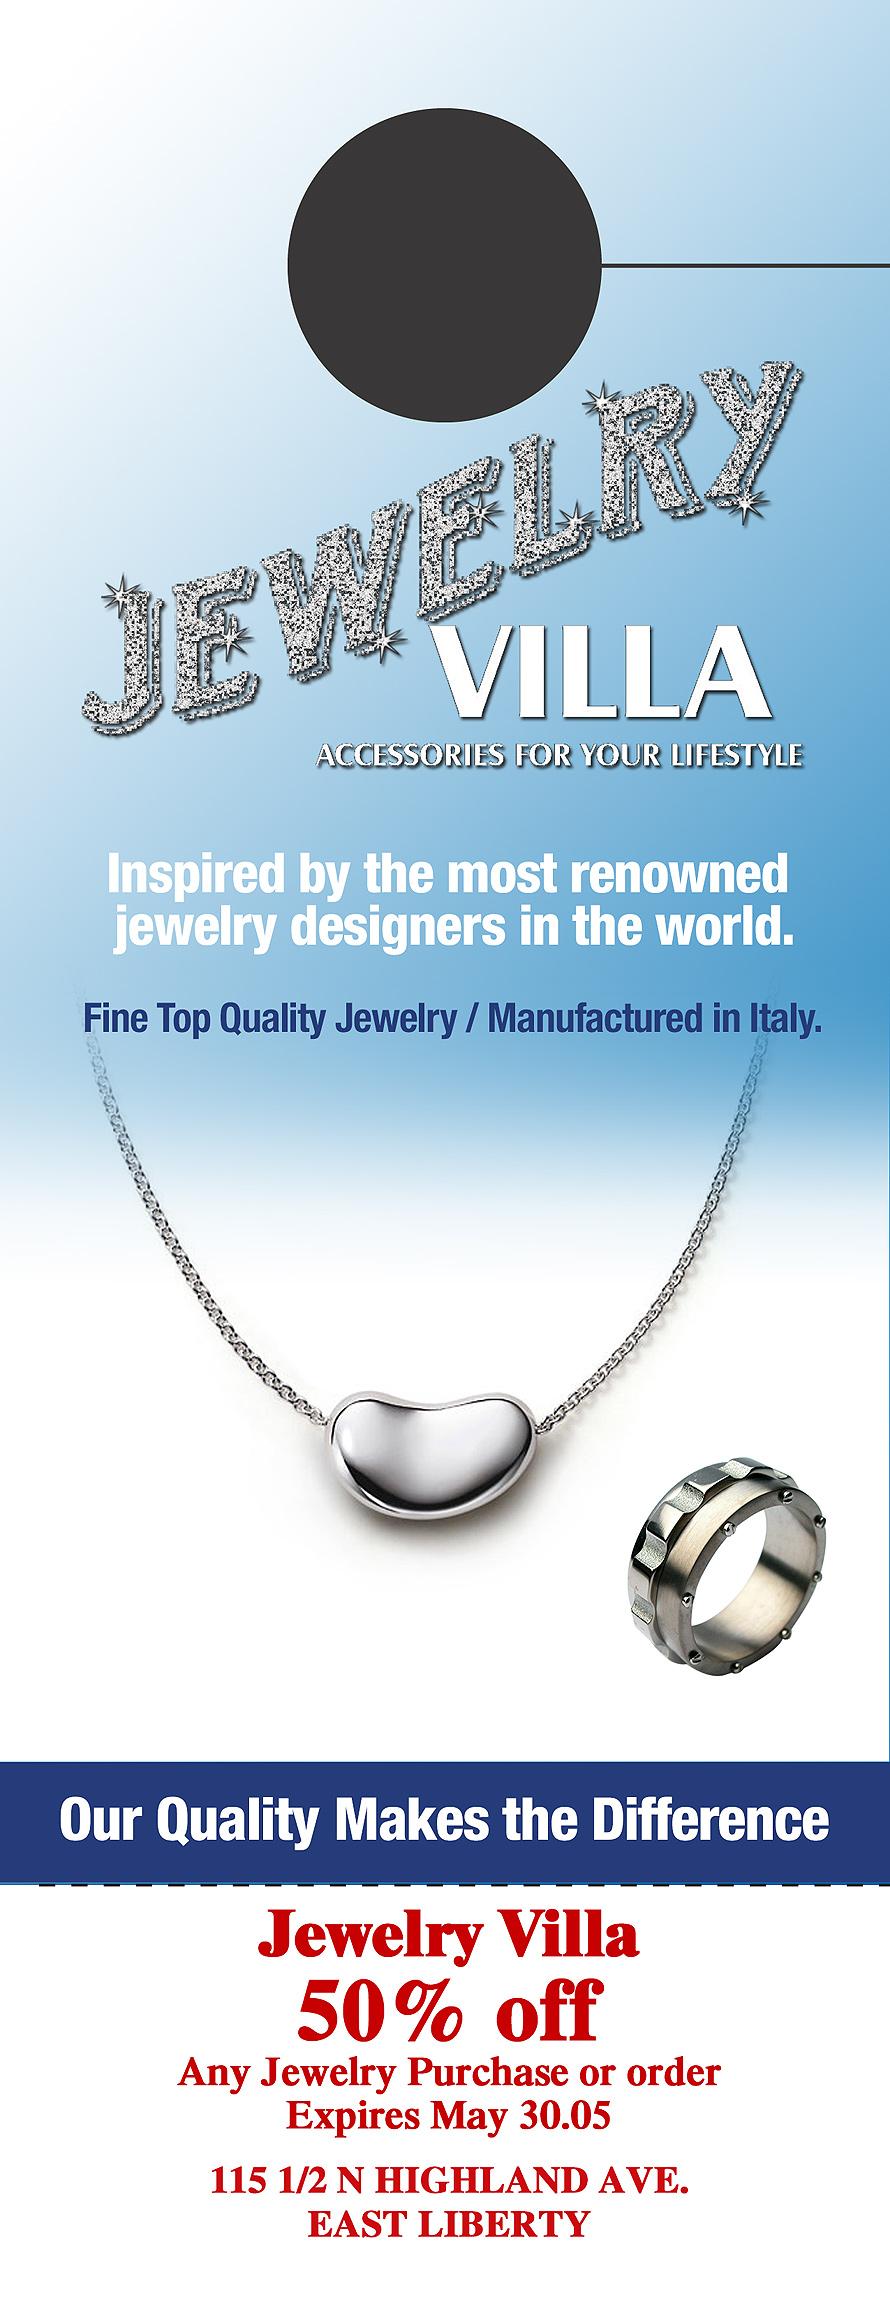 Jewelry Villa